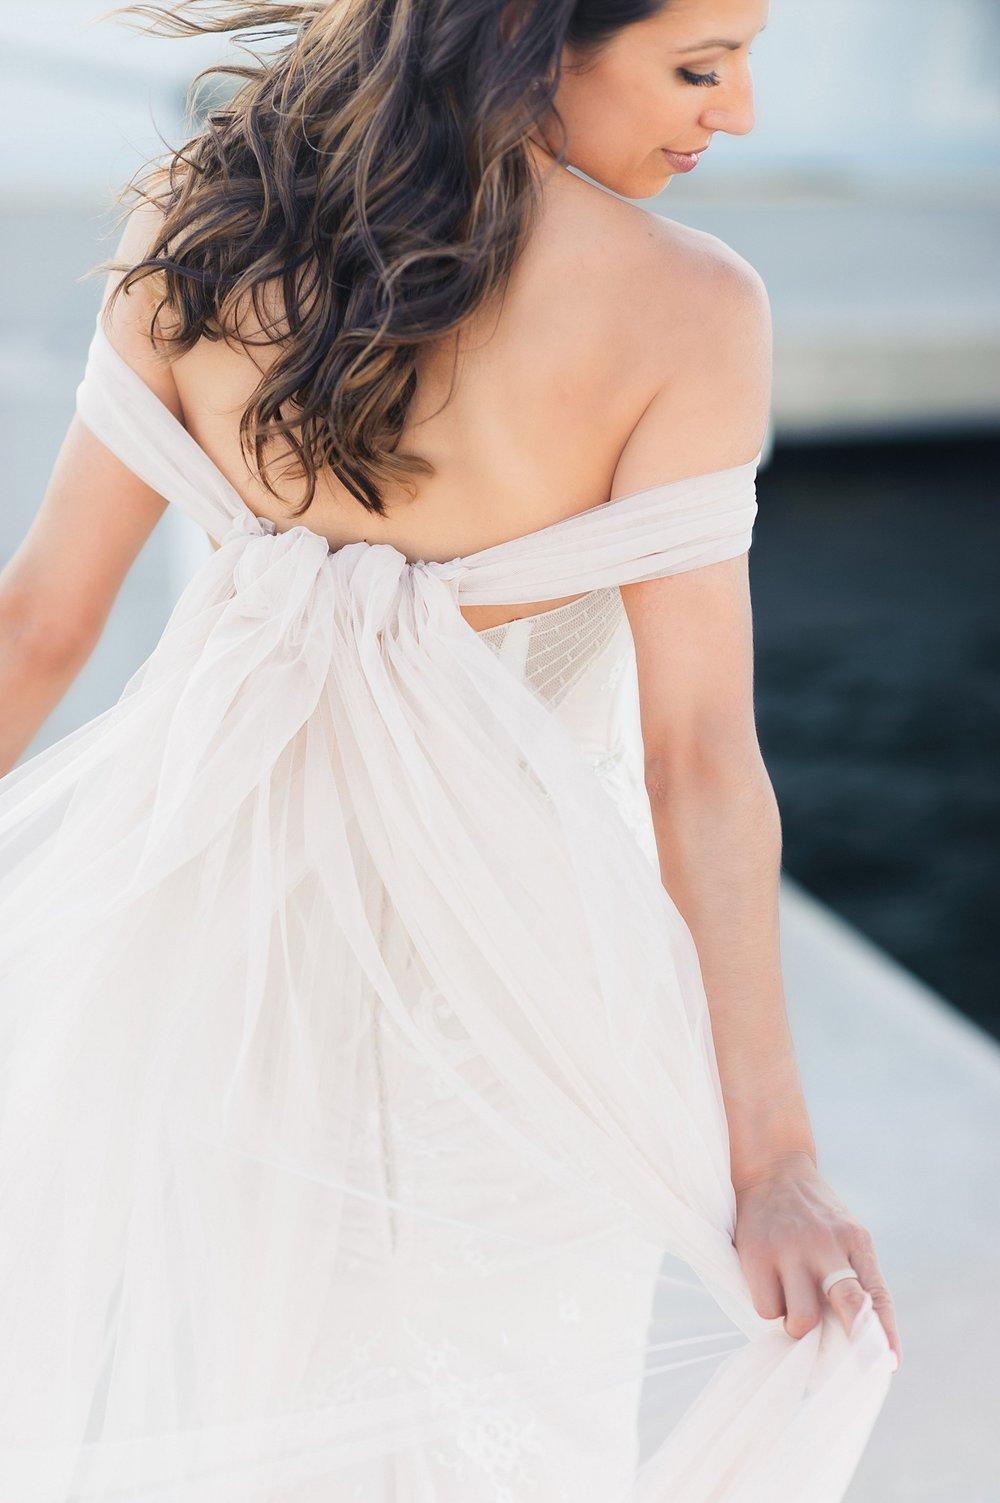 JessicaBordnerPhotography_1089.jpg